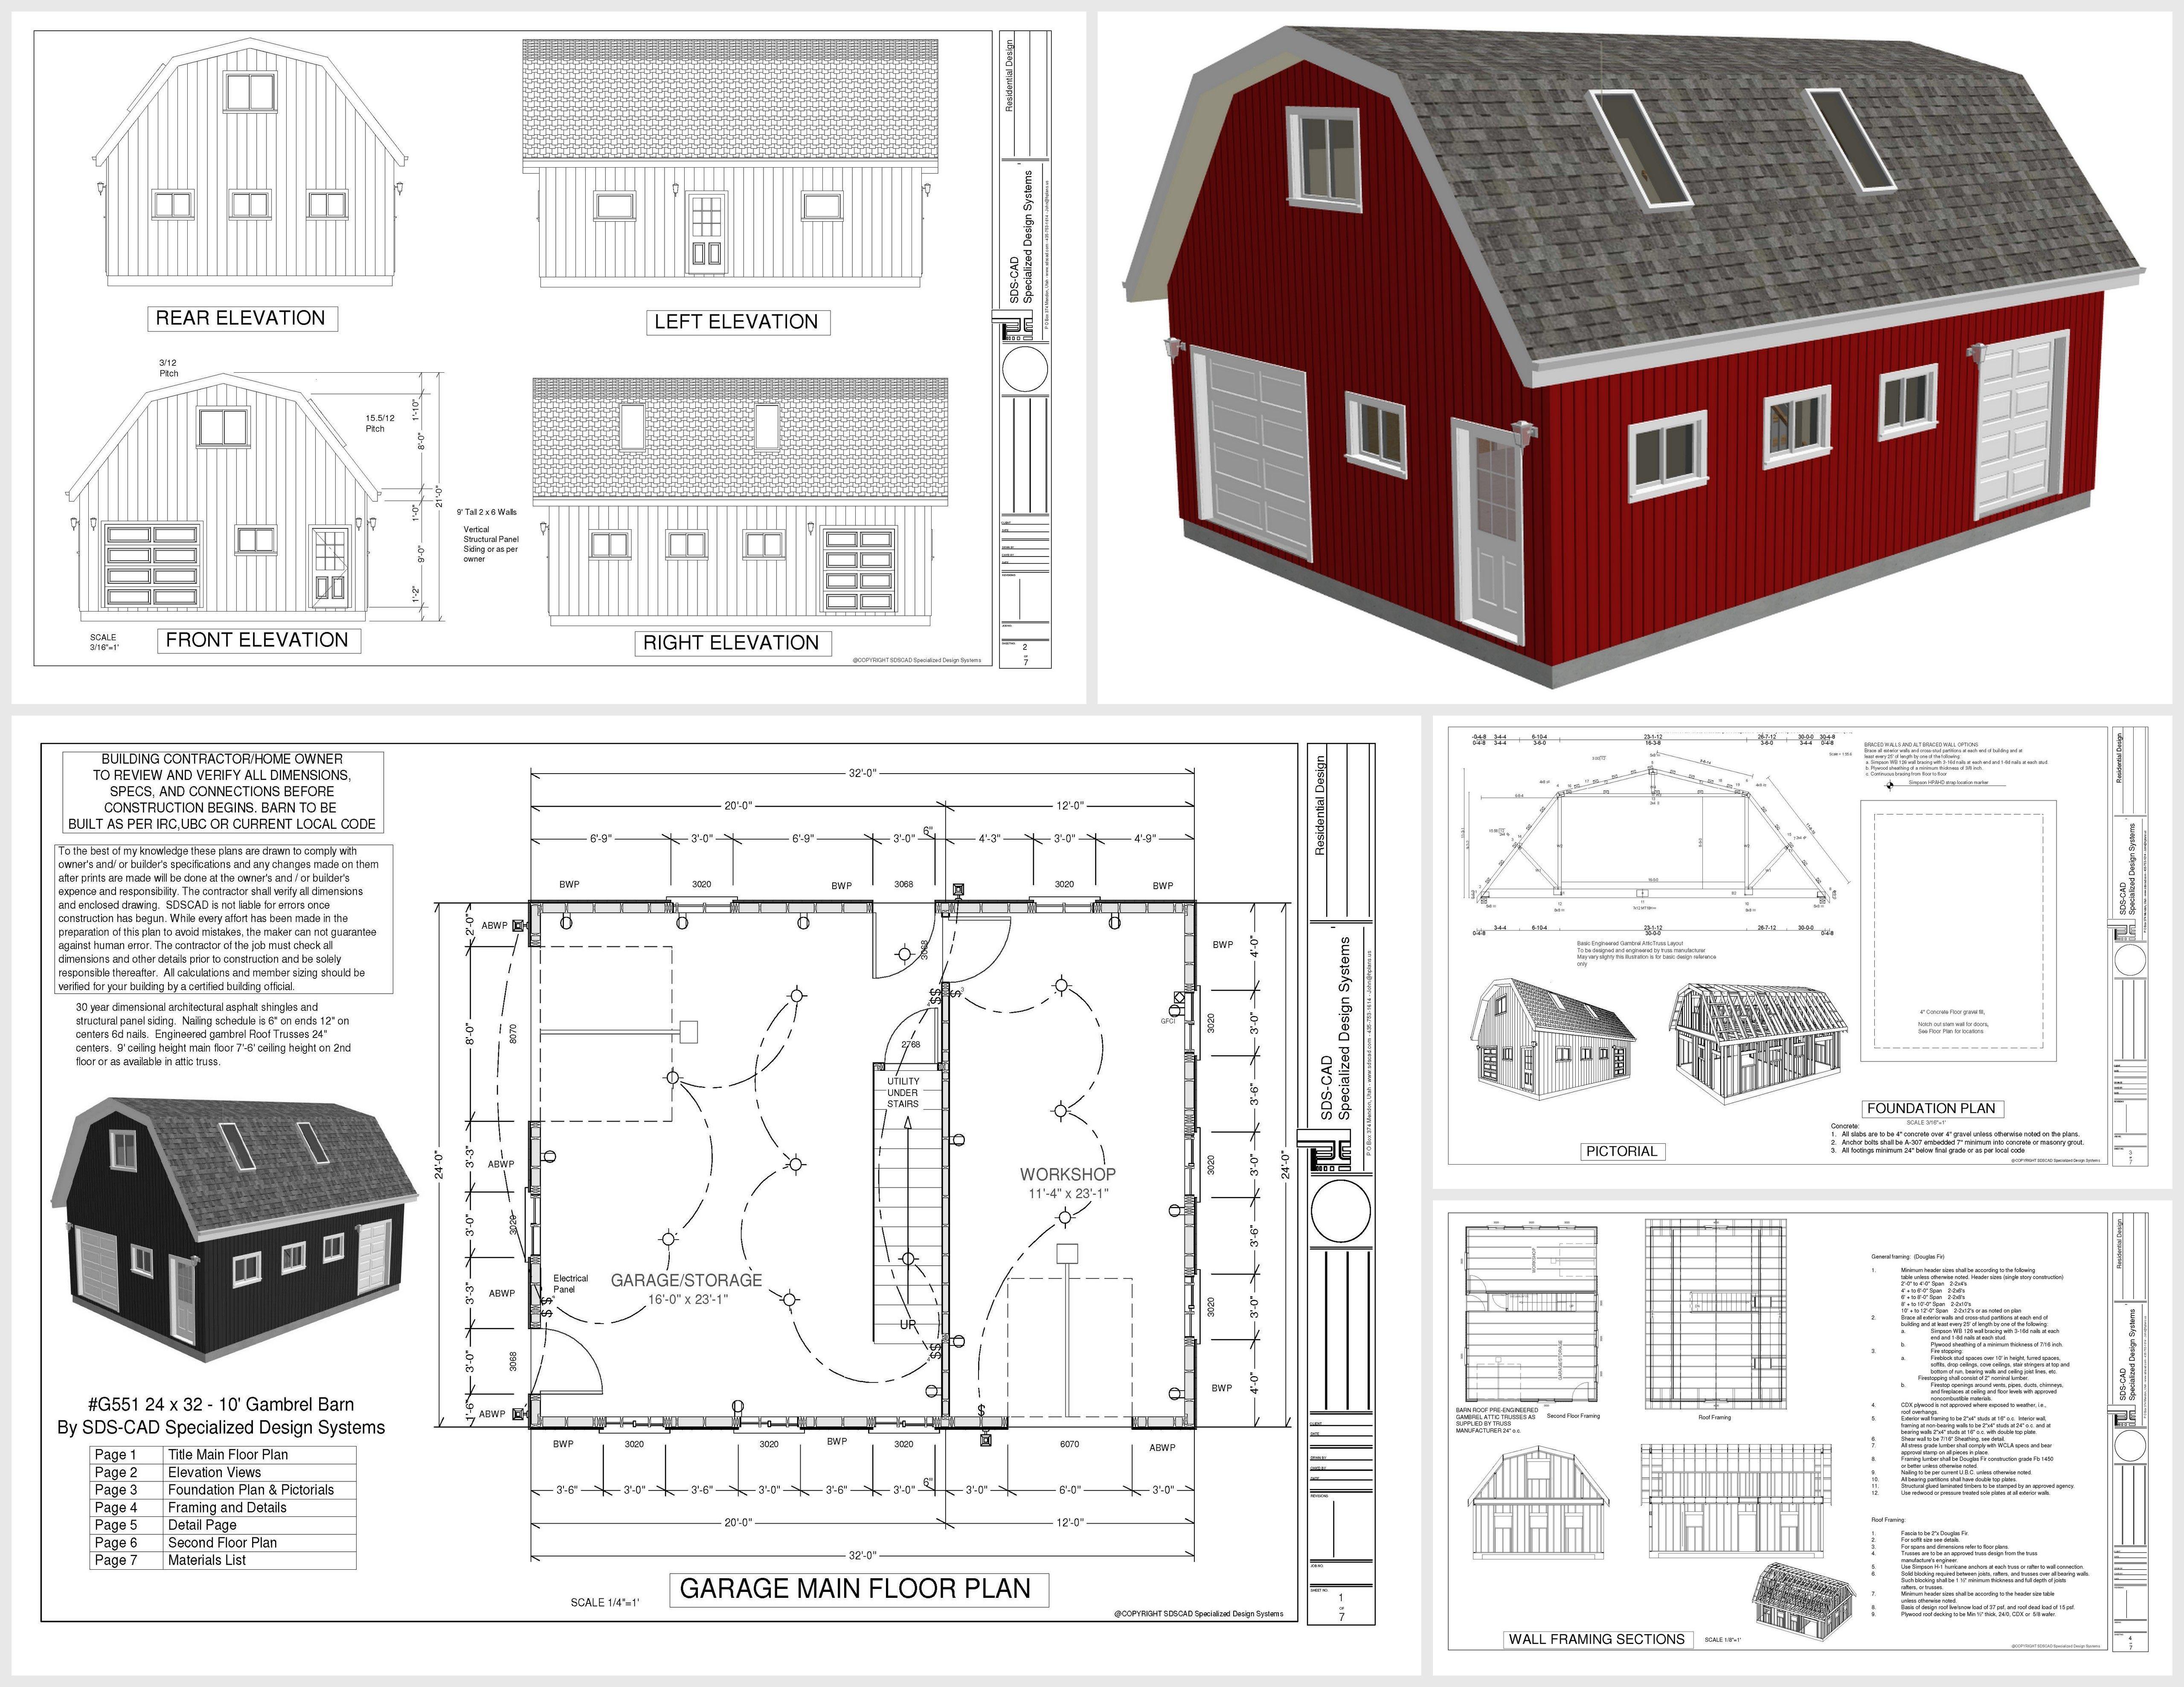 G551 24 X 32 X 10 Gambrel Barn Plans With Loft In Pdf Mendon Cottage Books In 2020 Barndominium Floor Plans Floor Plans Gambrel Barn